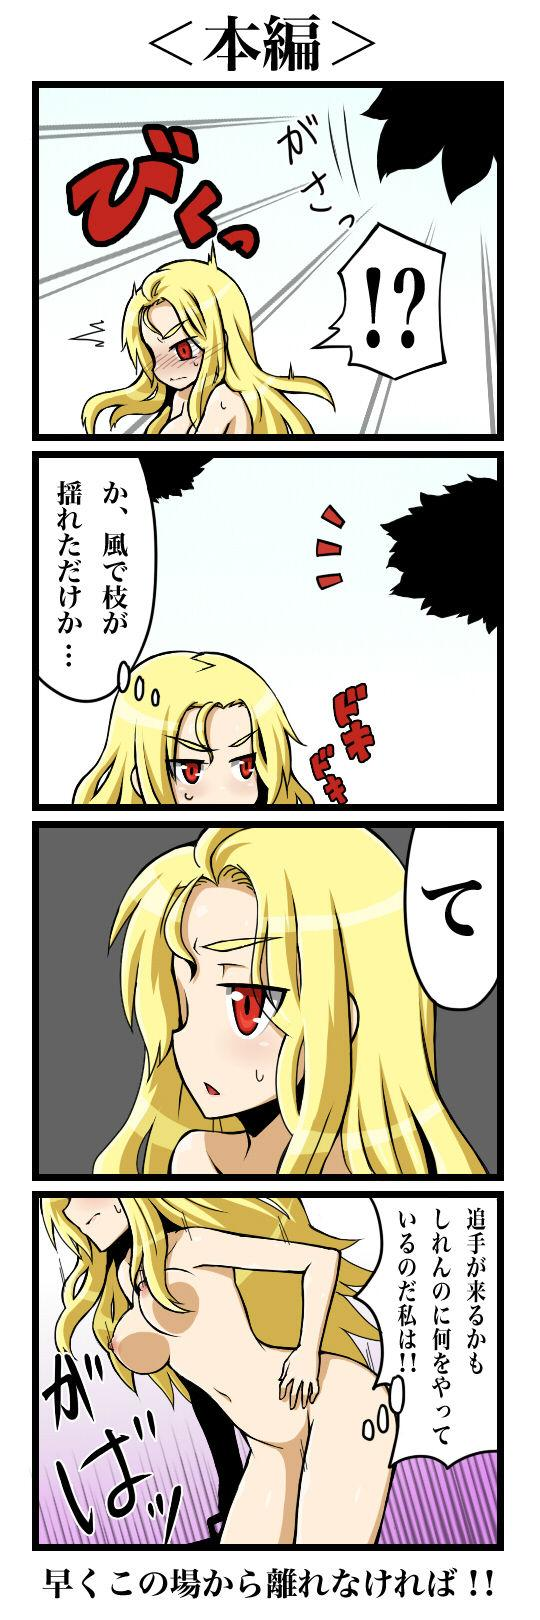 Valkyria-san no Bouken 6